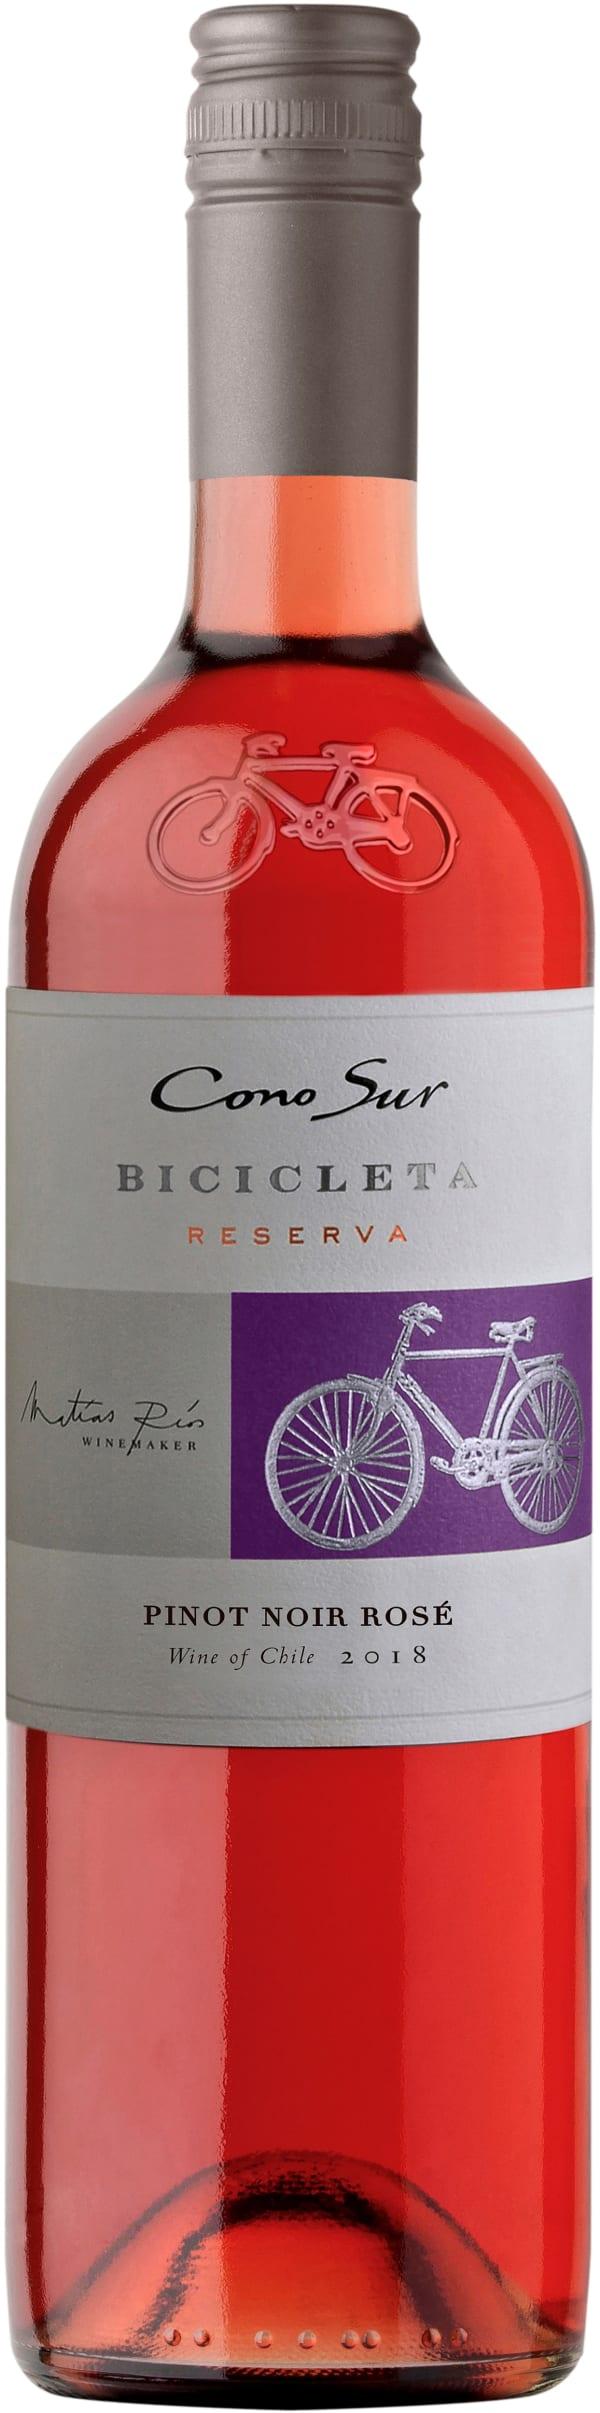 Cono Sur Bicicleta Pinot Noir Rosé 2019